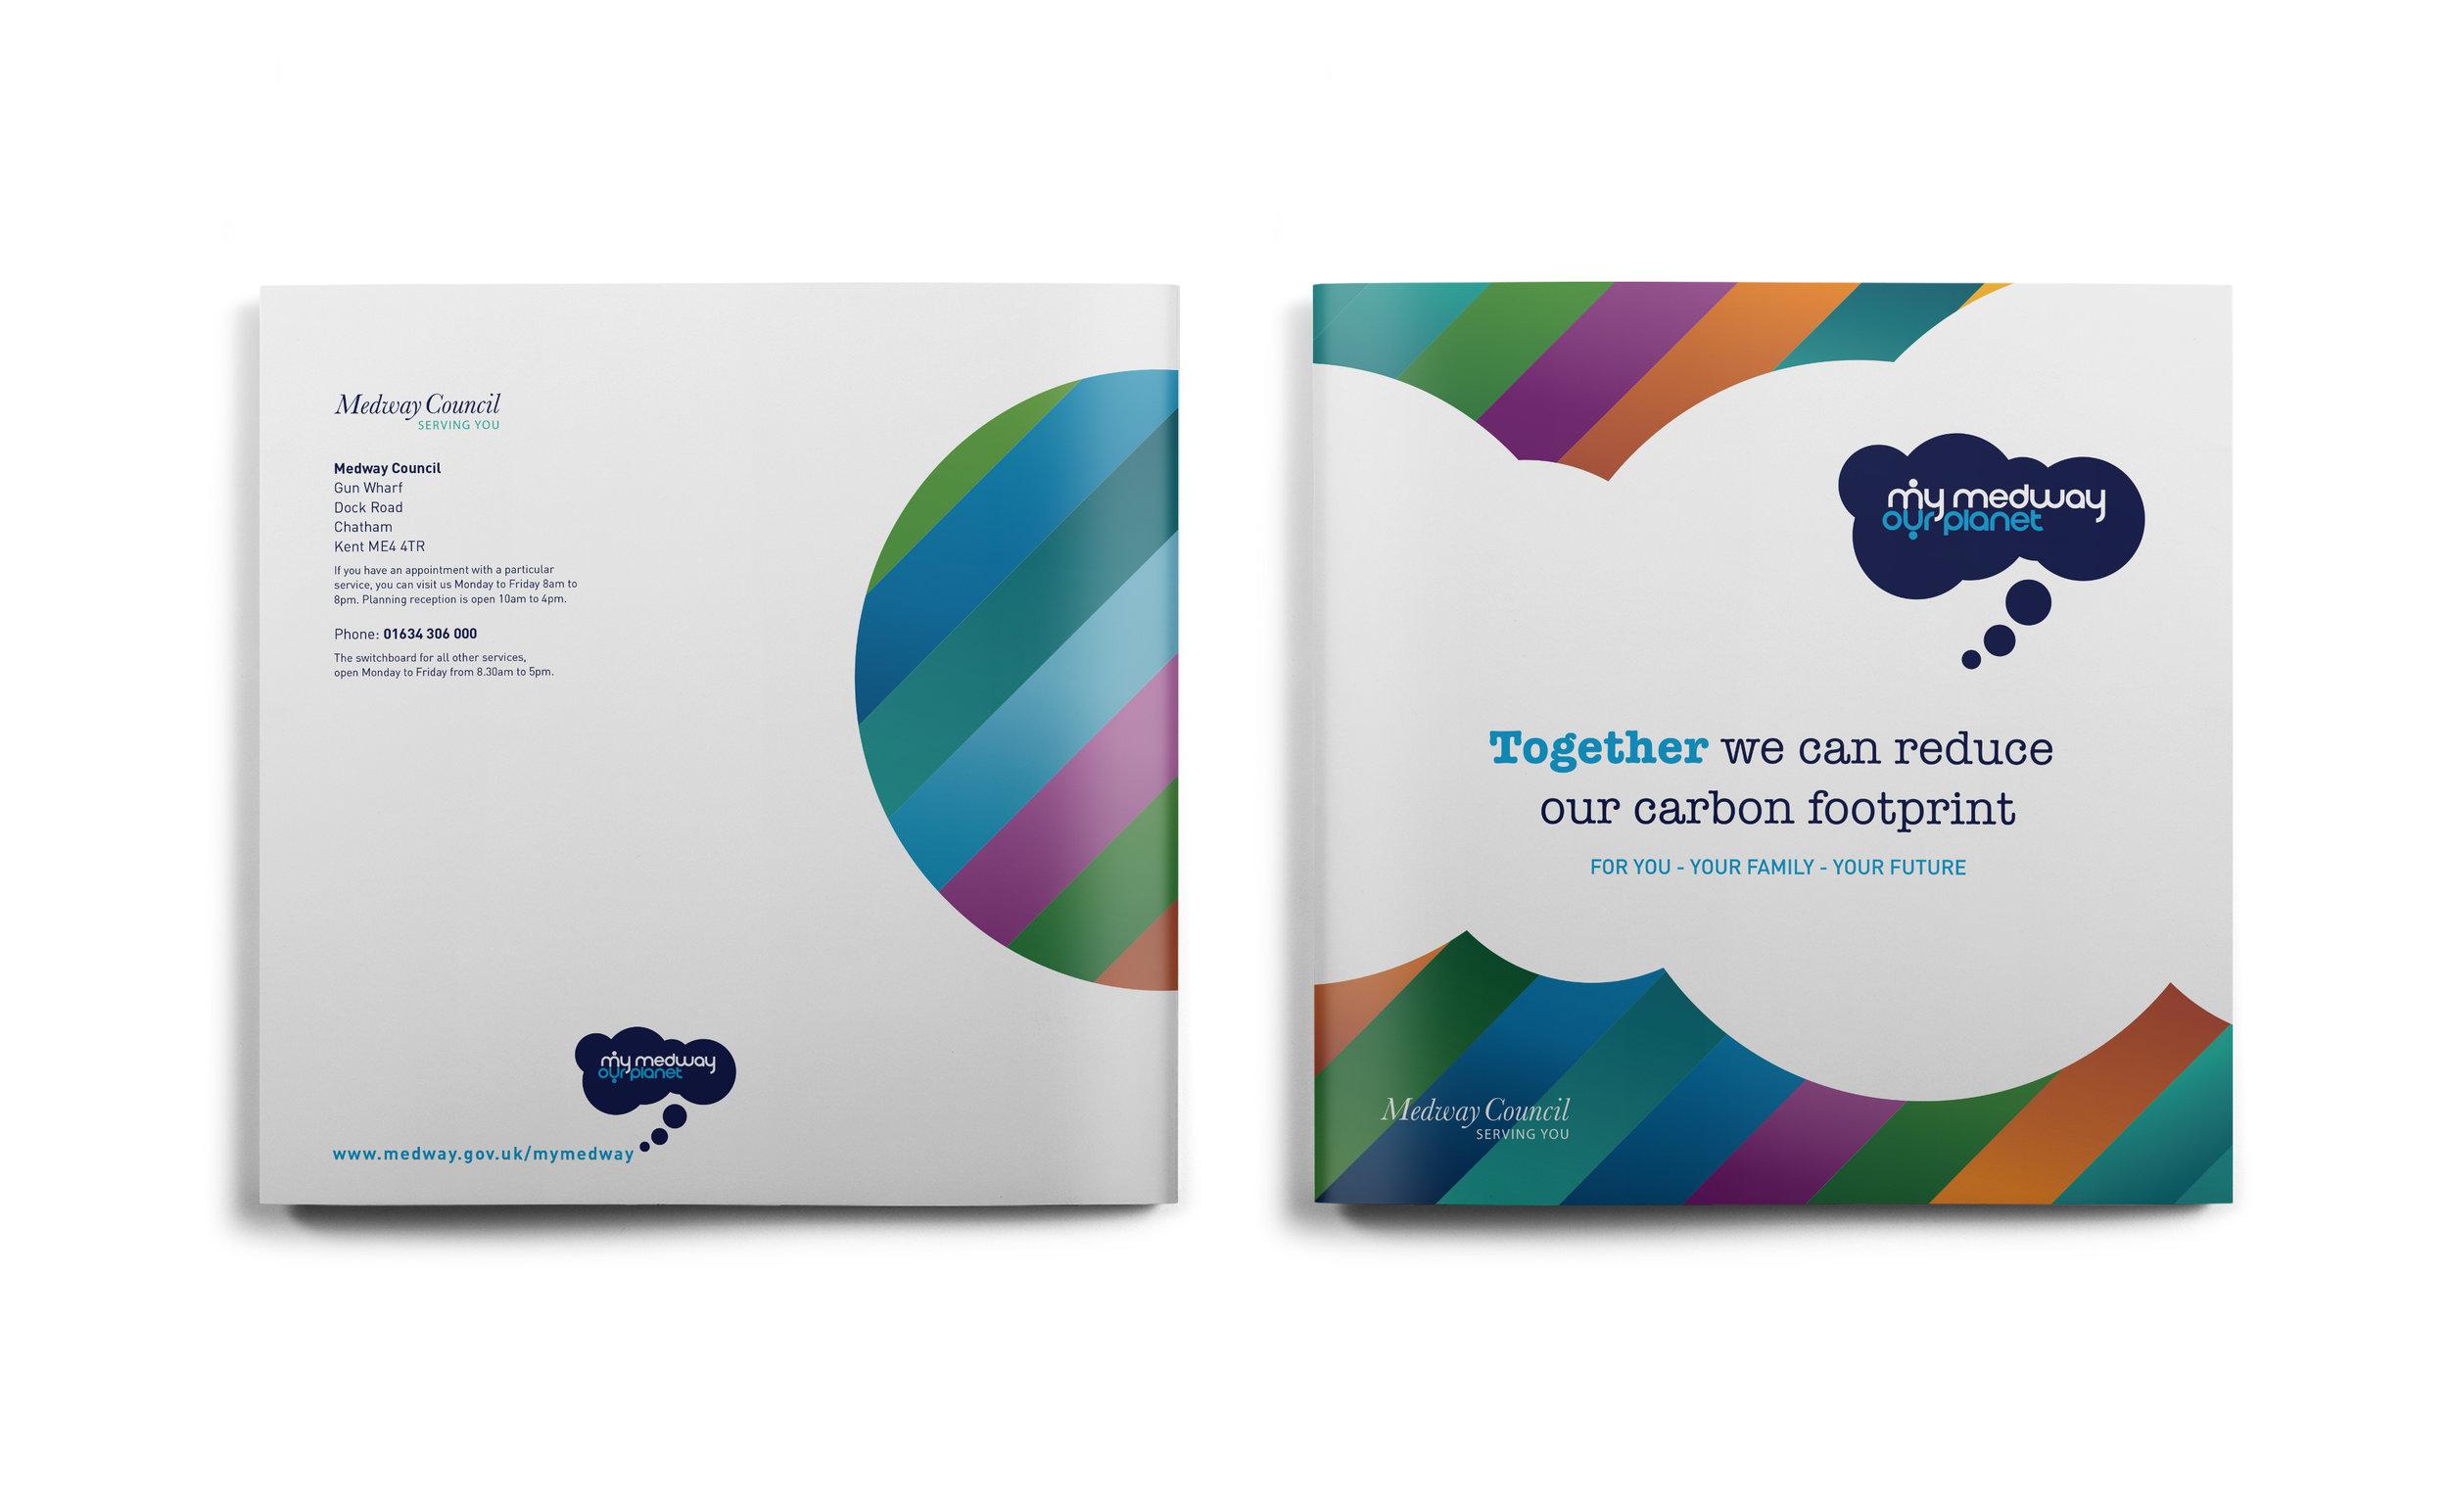 medway squaer brochure cover all together.jpg